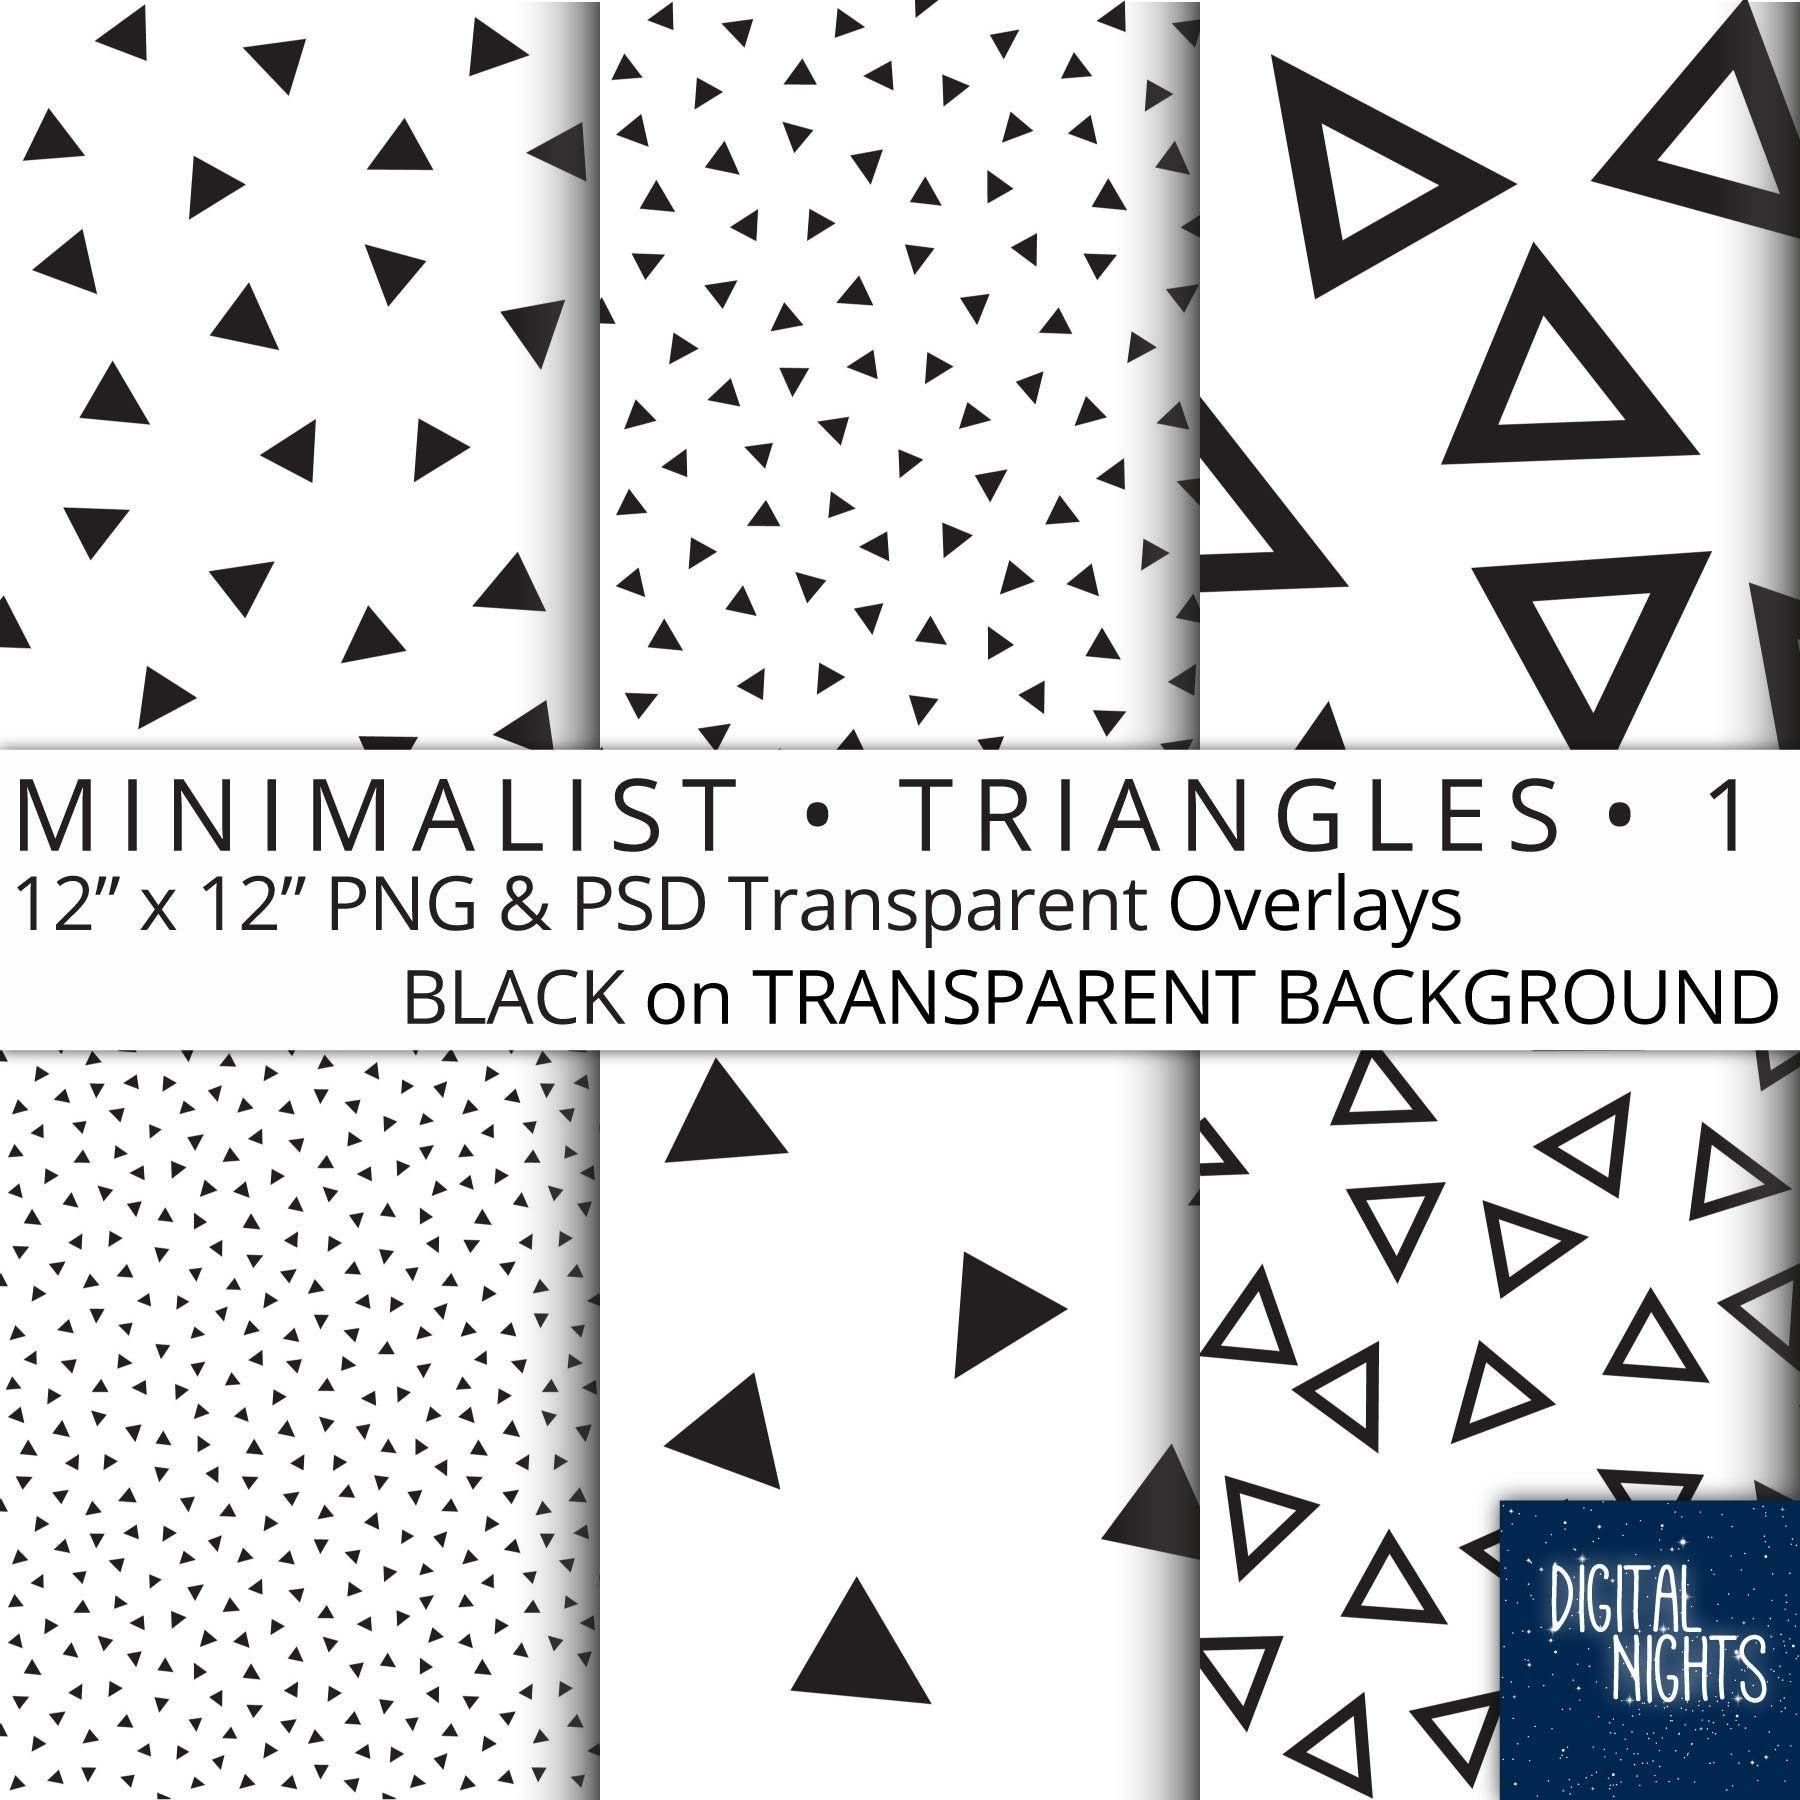 Minimalist Triangles Set 1 Black On Transparent Background Etsy Digital Paper Overlays Transparent Digital Overlays